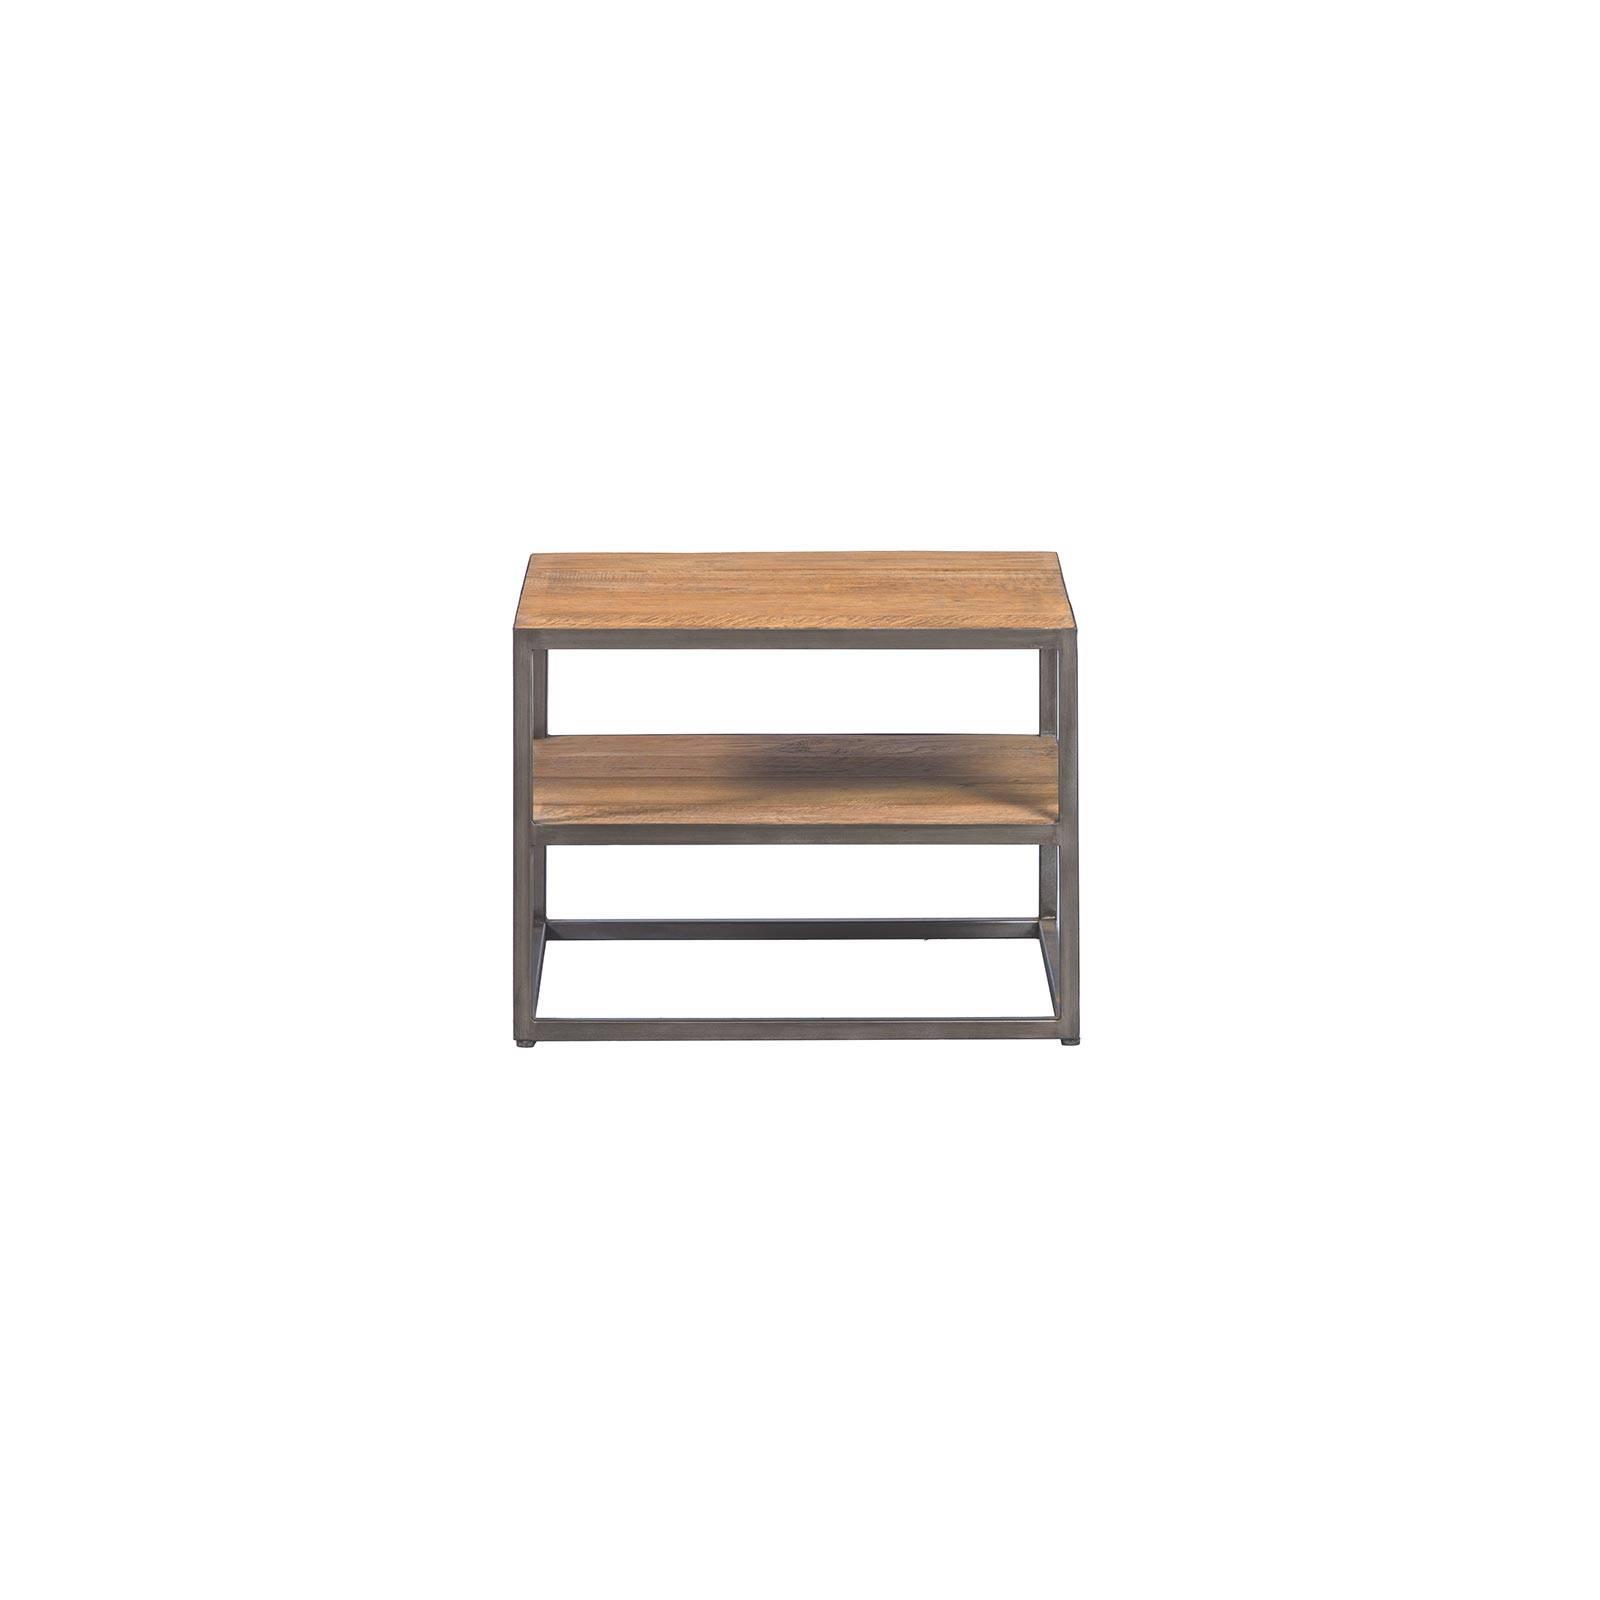 Table basse carrée   Teck Essential